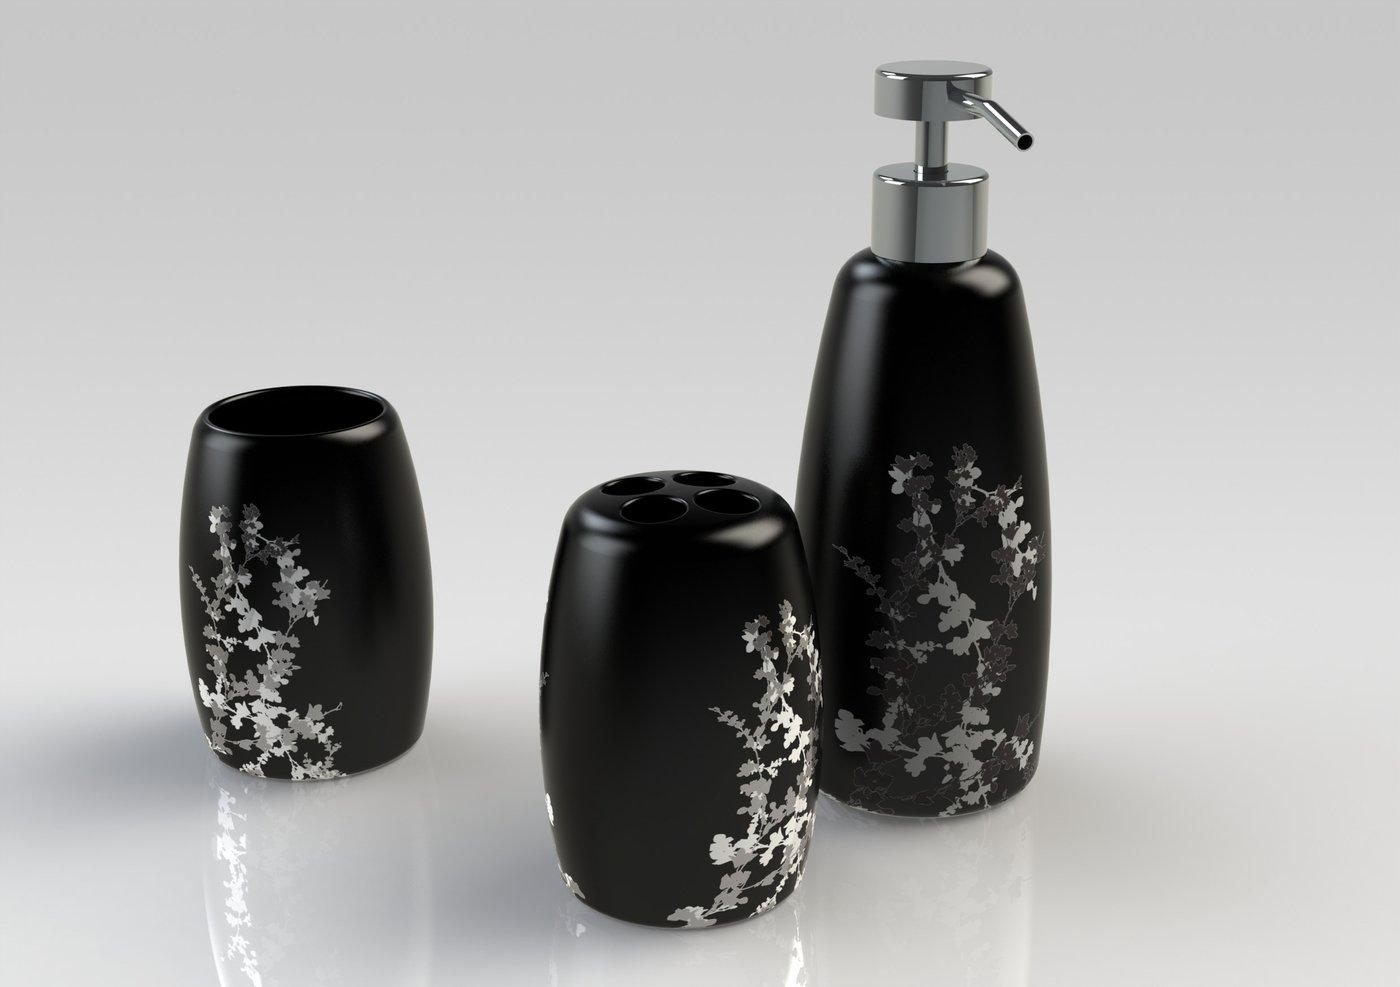 Roper Rhodes - Laura Ashley Bathroom Accessories by Nick Hunter at ...